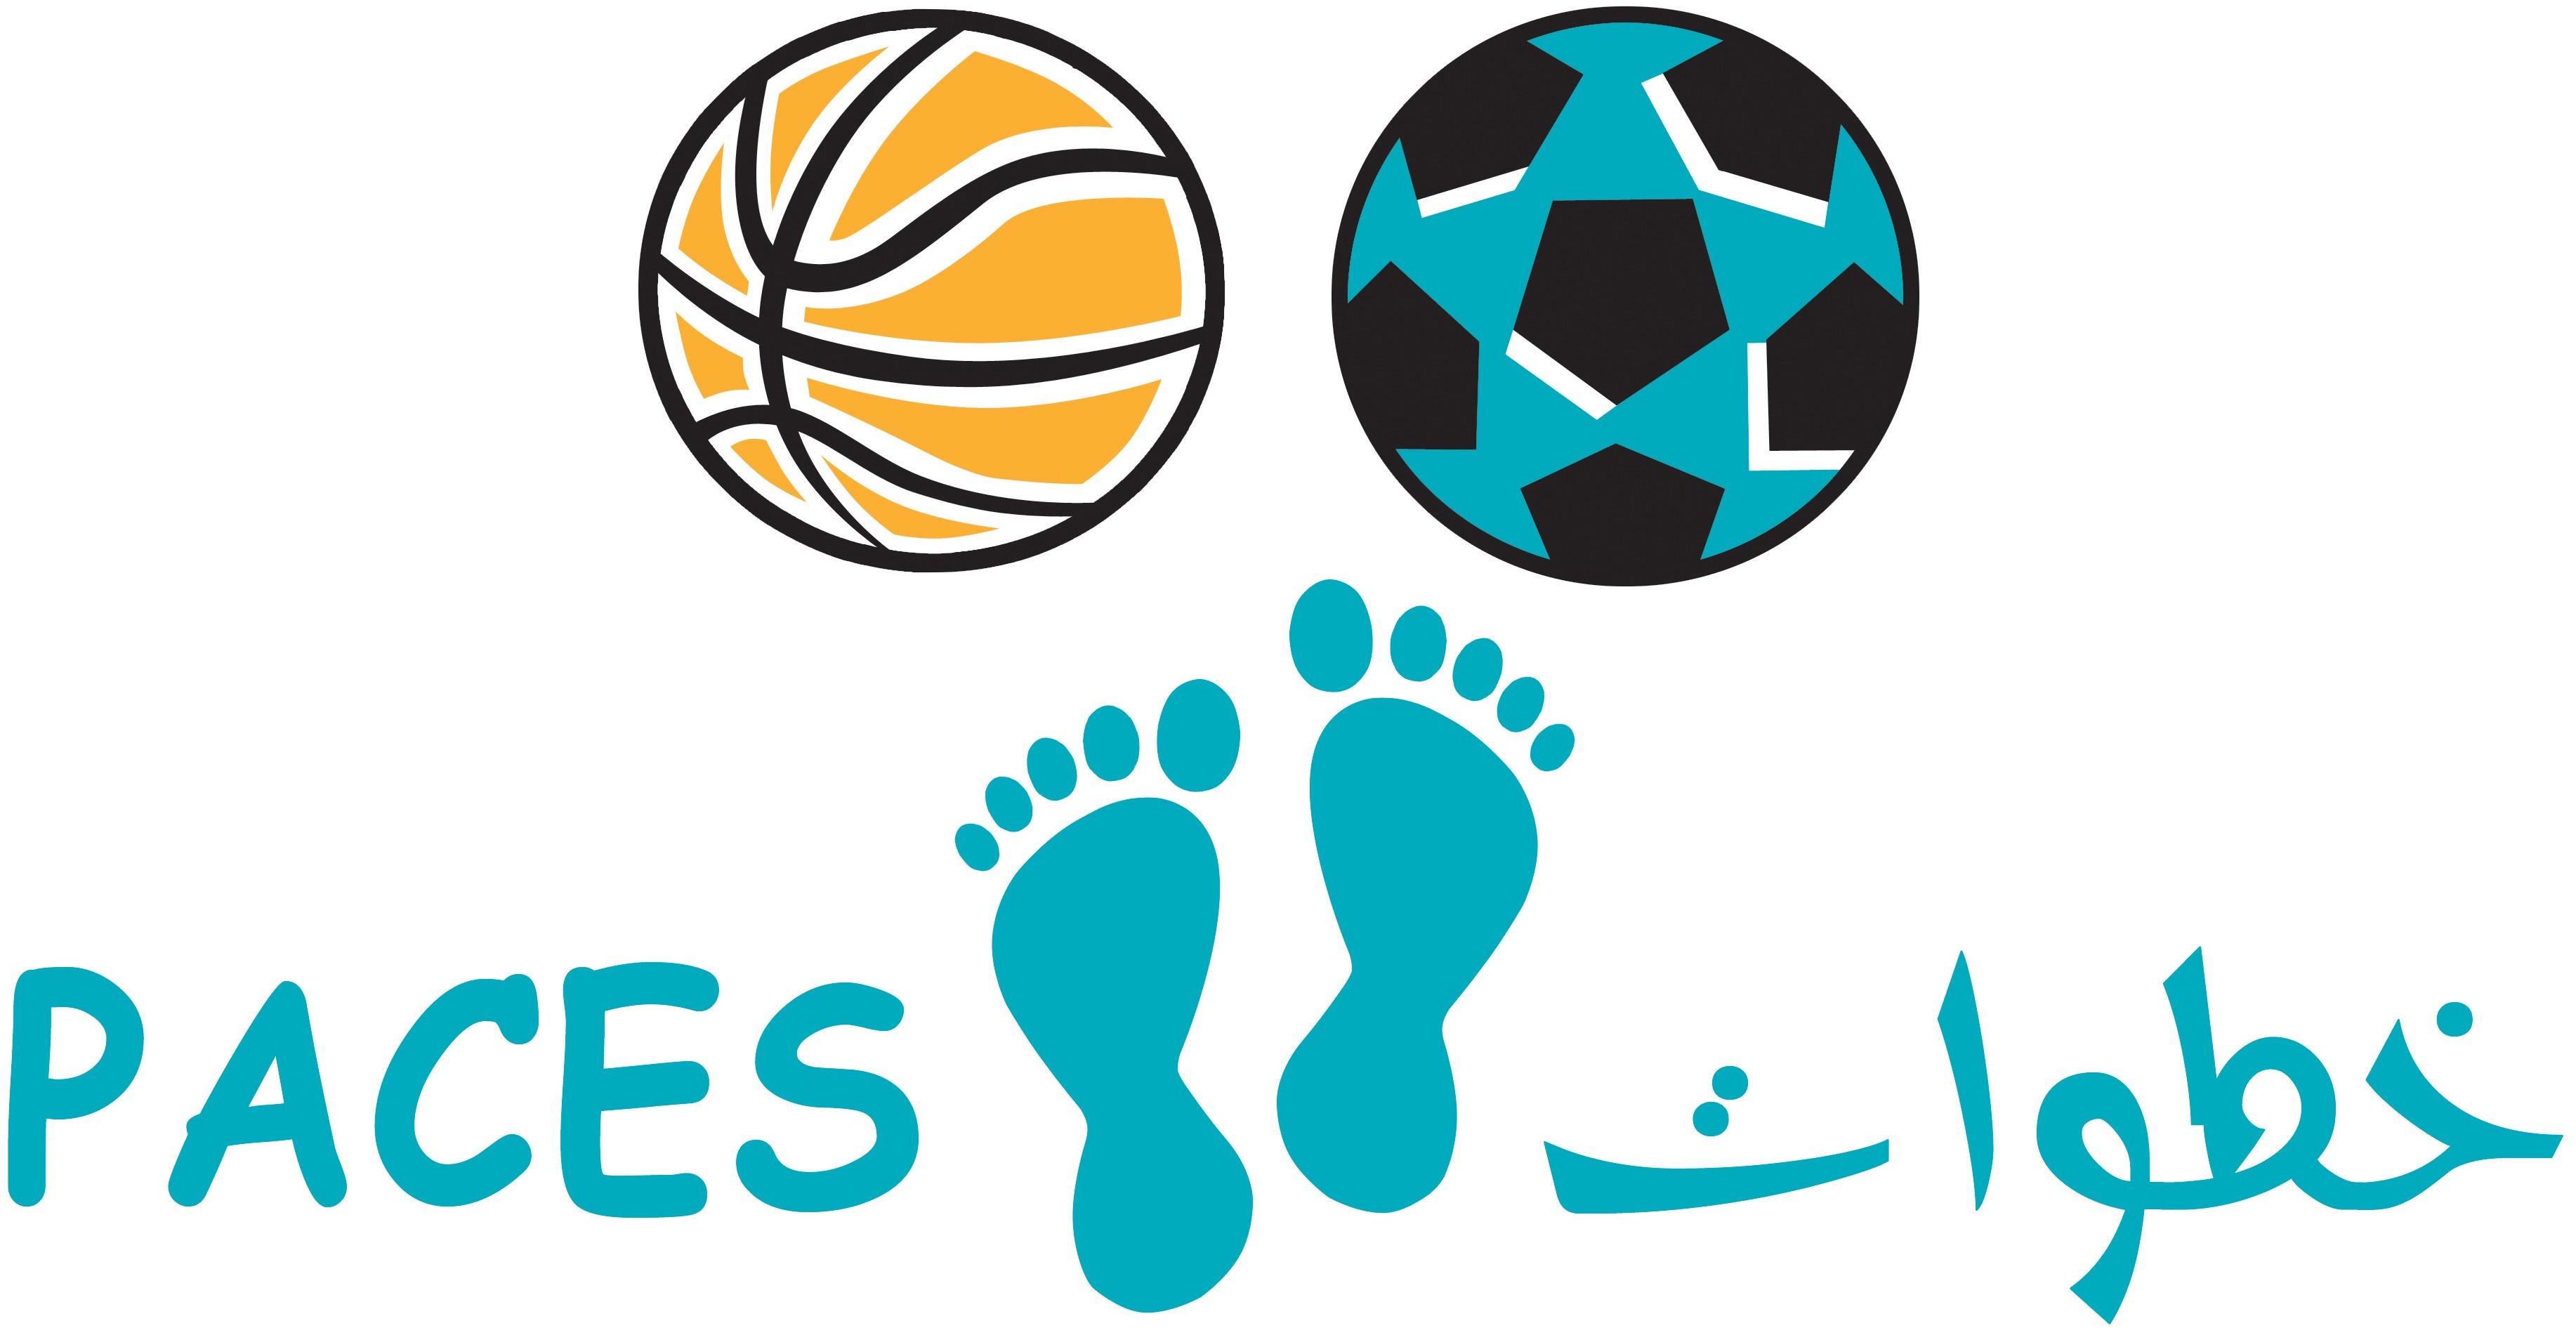 Palestine Association for Children's Encouragement of Sports - PACES